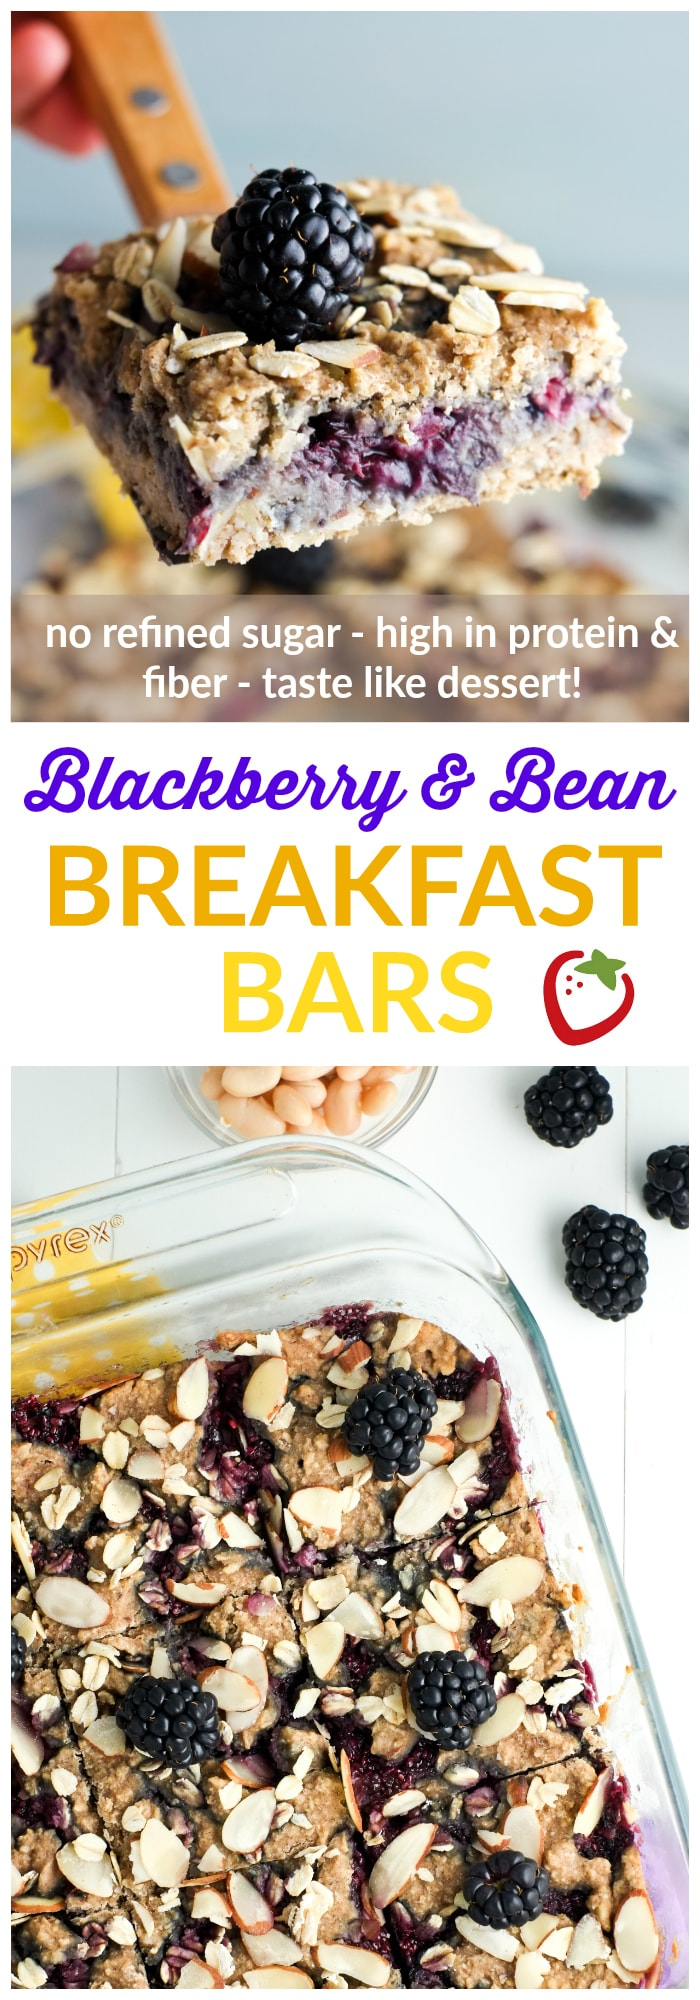 Food & Drink | Blackberry and Bean Breakfast Bars | Super Healthy Kids